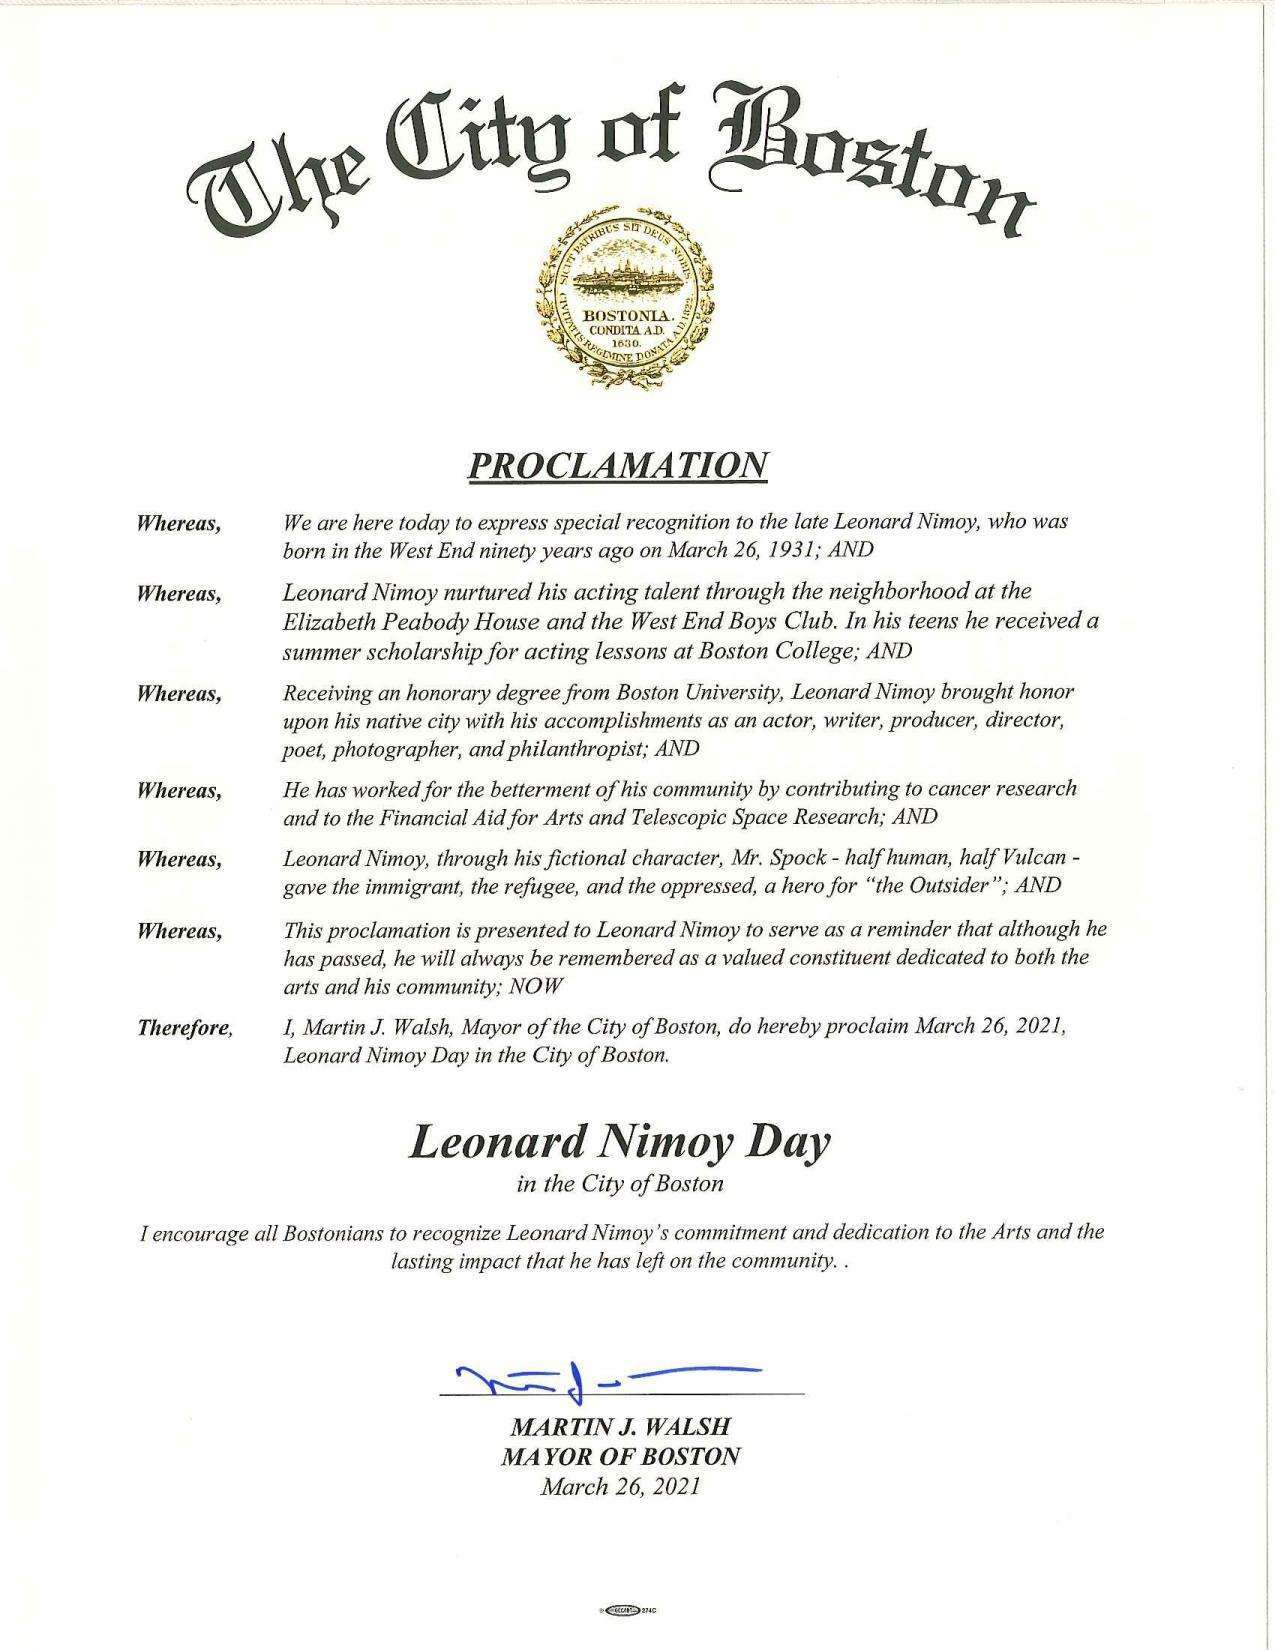 Leonard Nimoy Day Proclamation